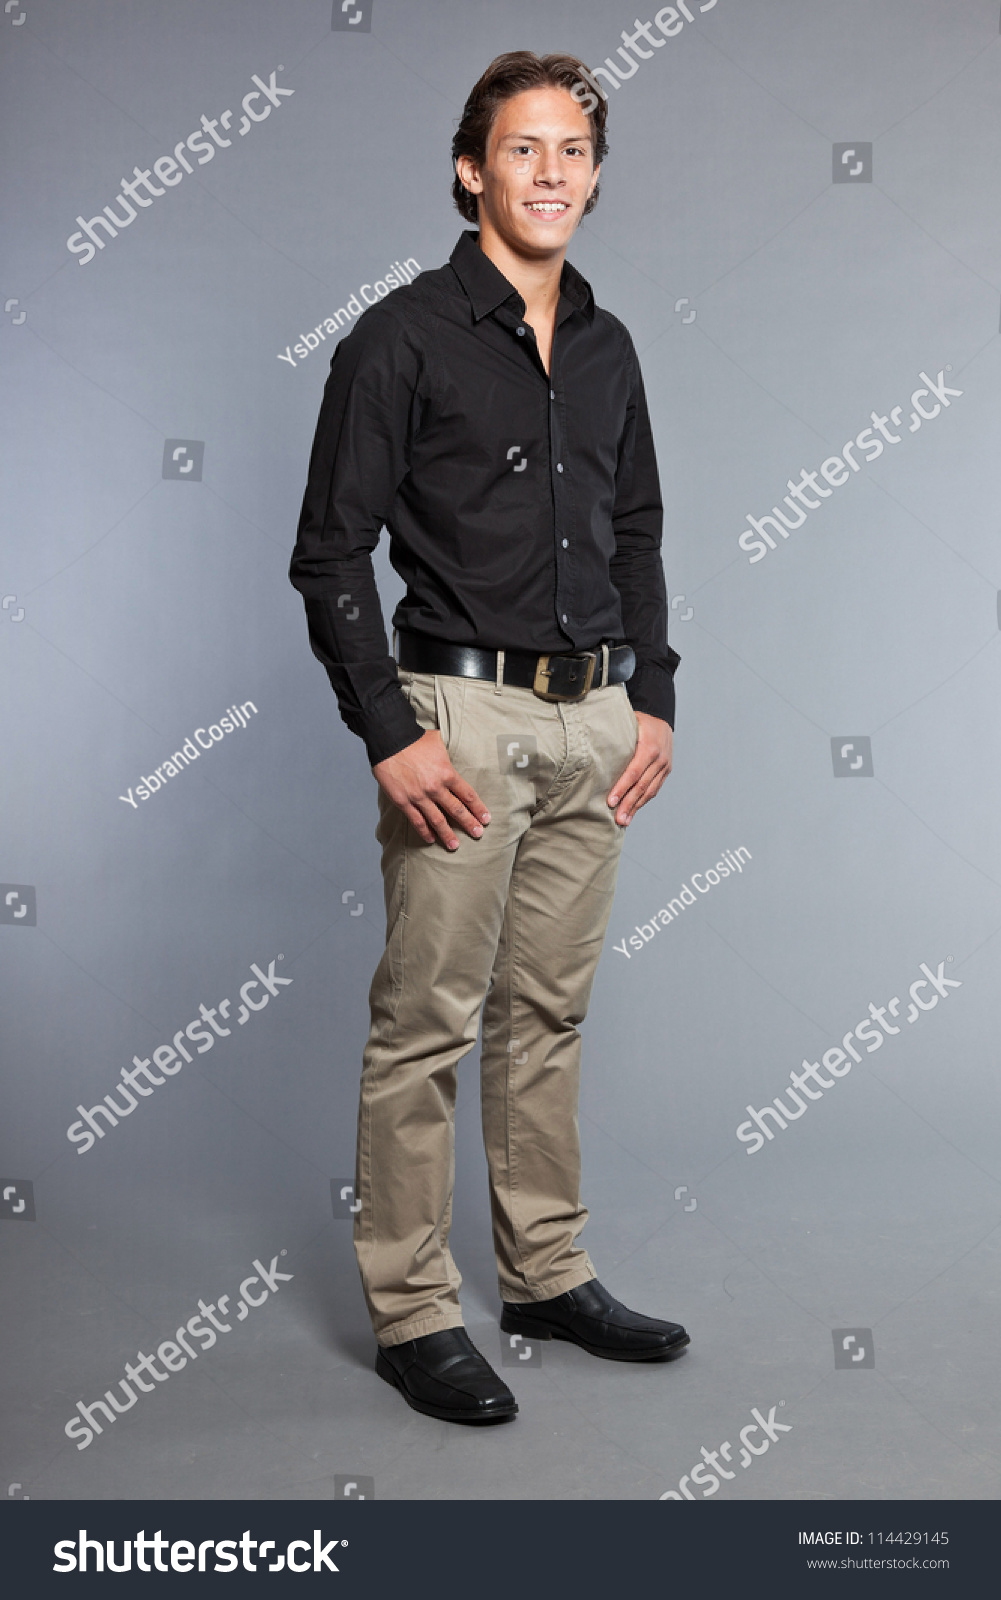 Brown Shirt With Black Pants